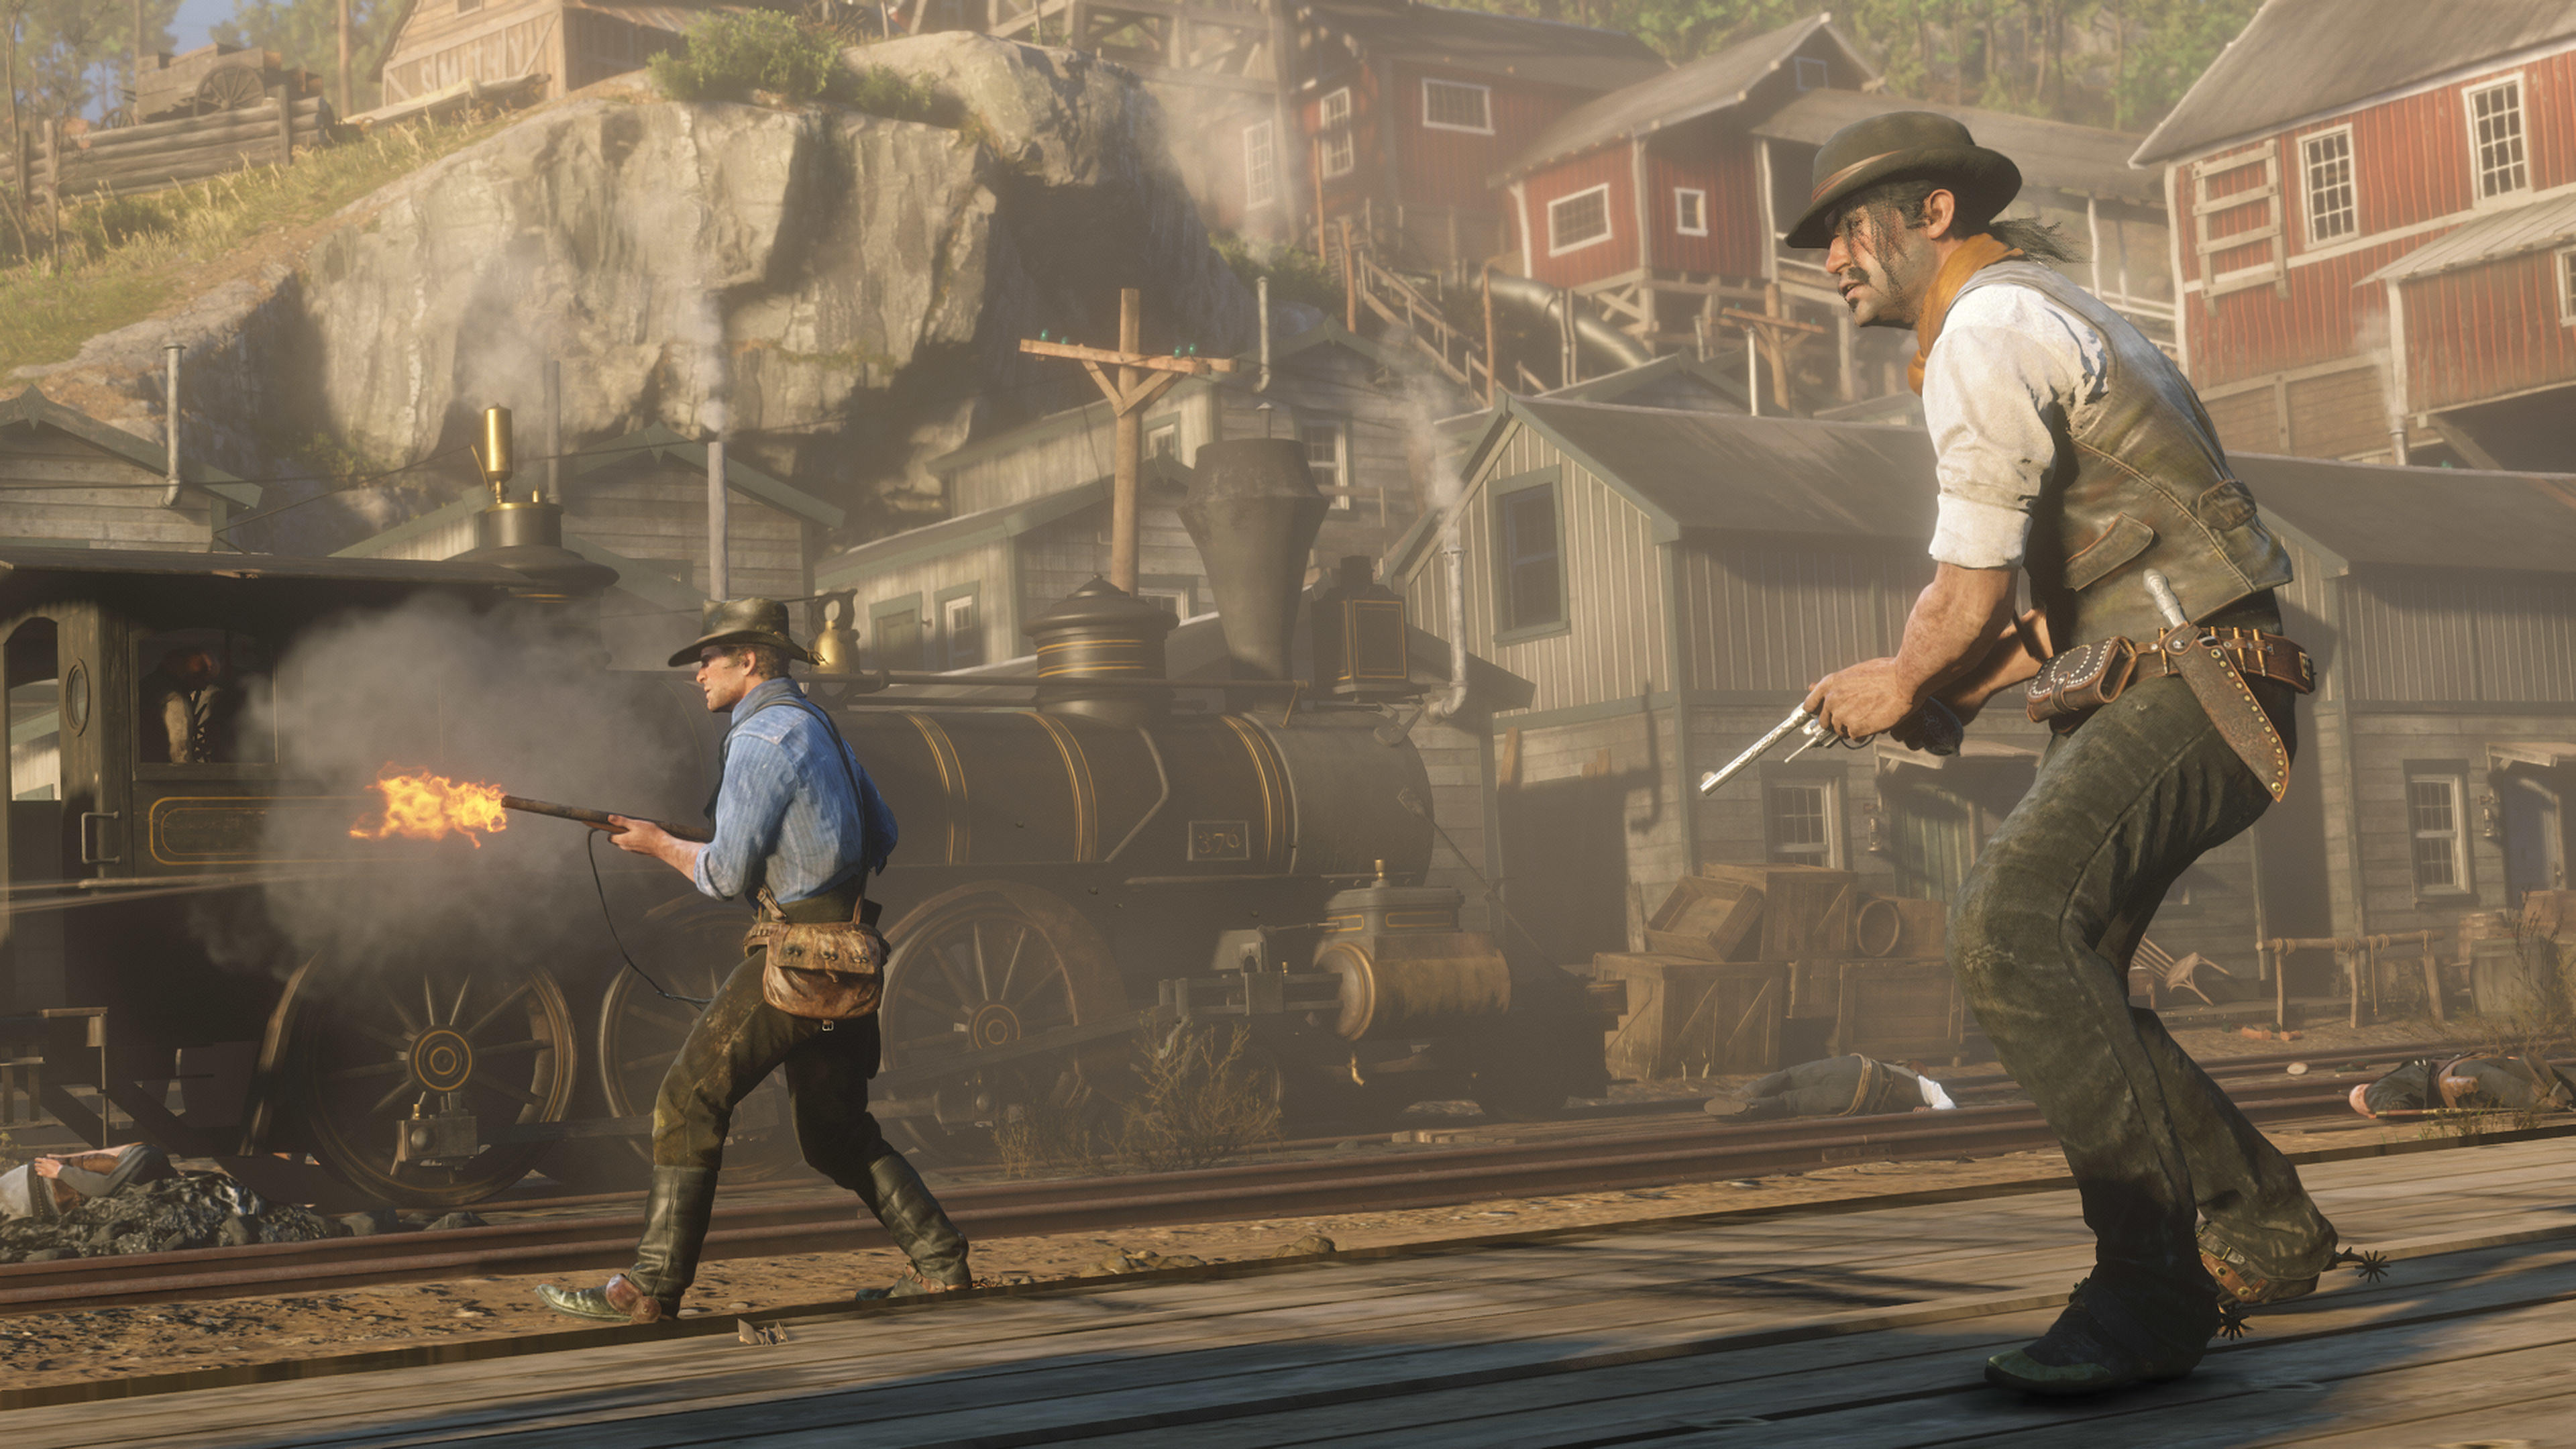 General 3840x2160 Red Dead Redemption Rockstar Games Red Dead Redemption 2 video games Arthur Morgan Javier Escuella